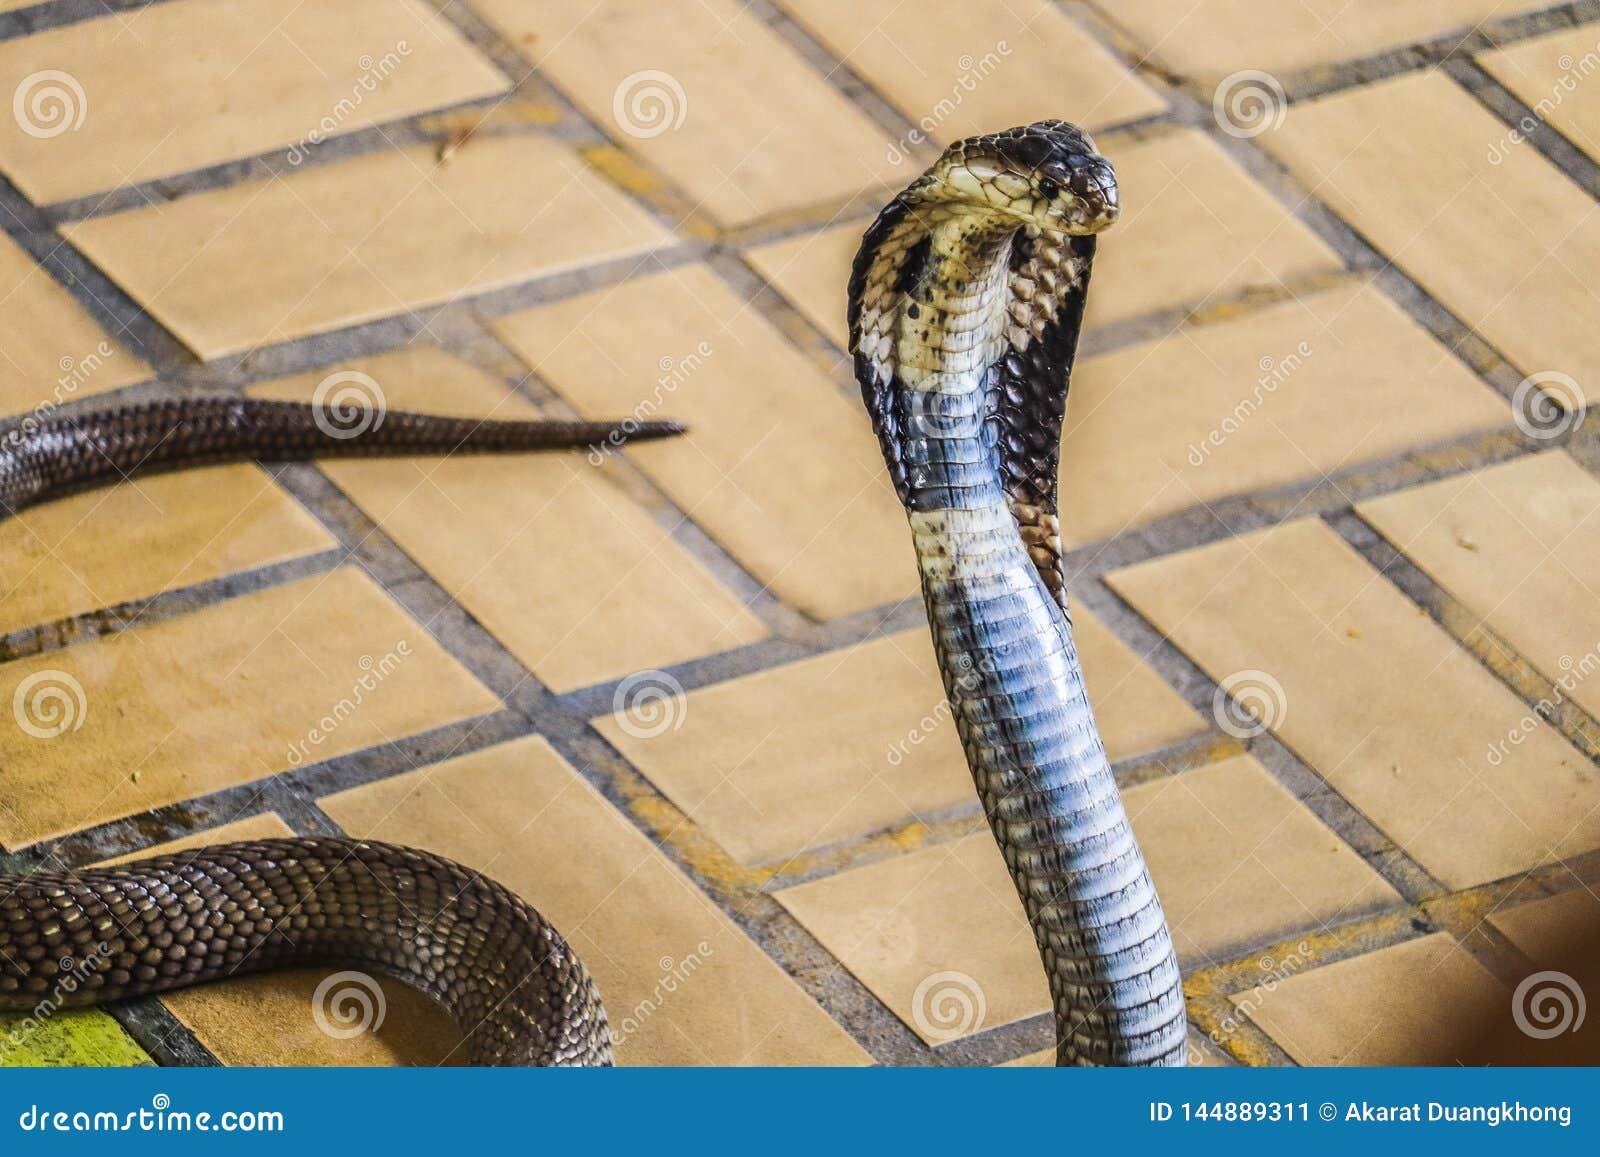 De cobra spreidde de kap uit